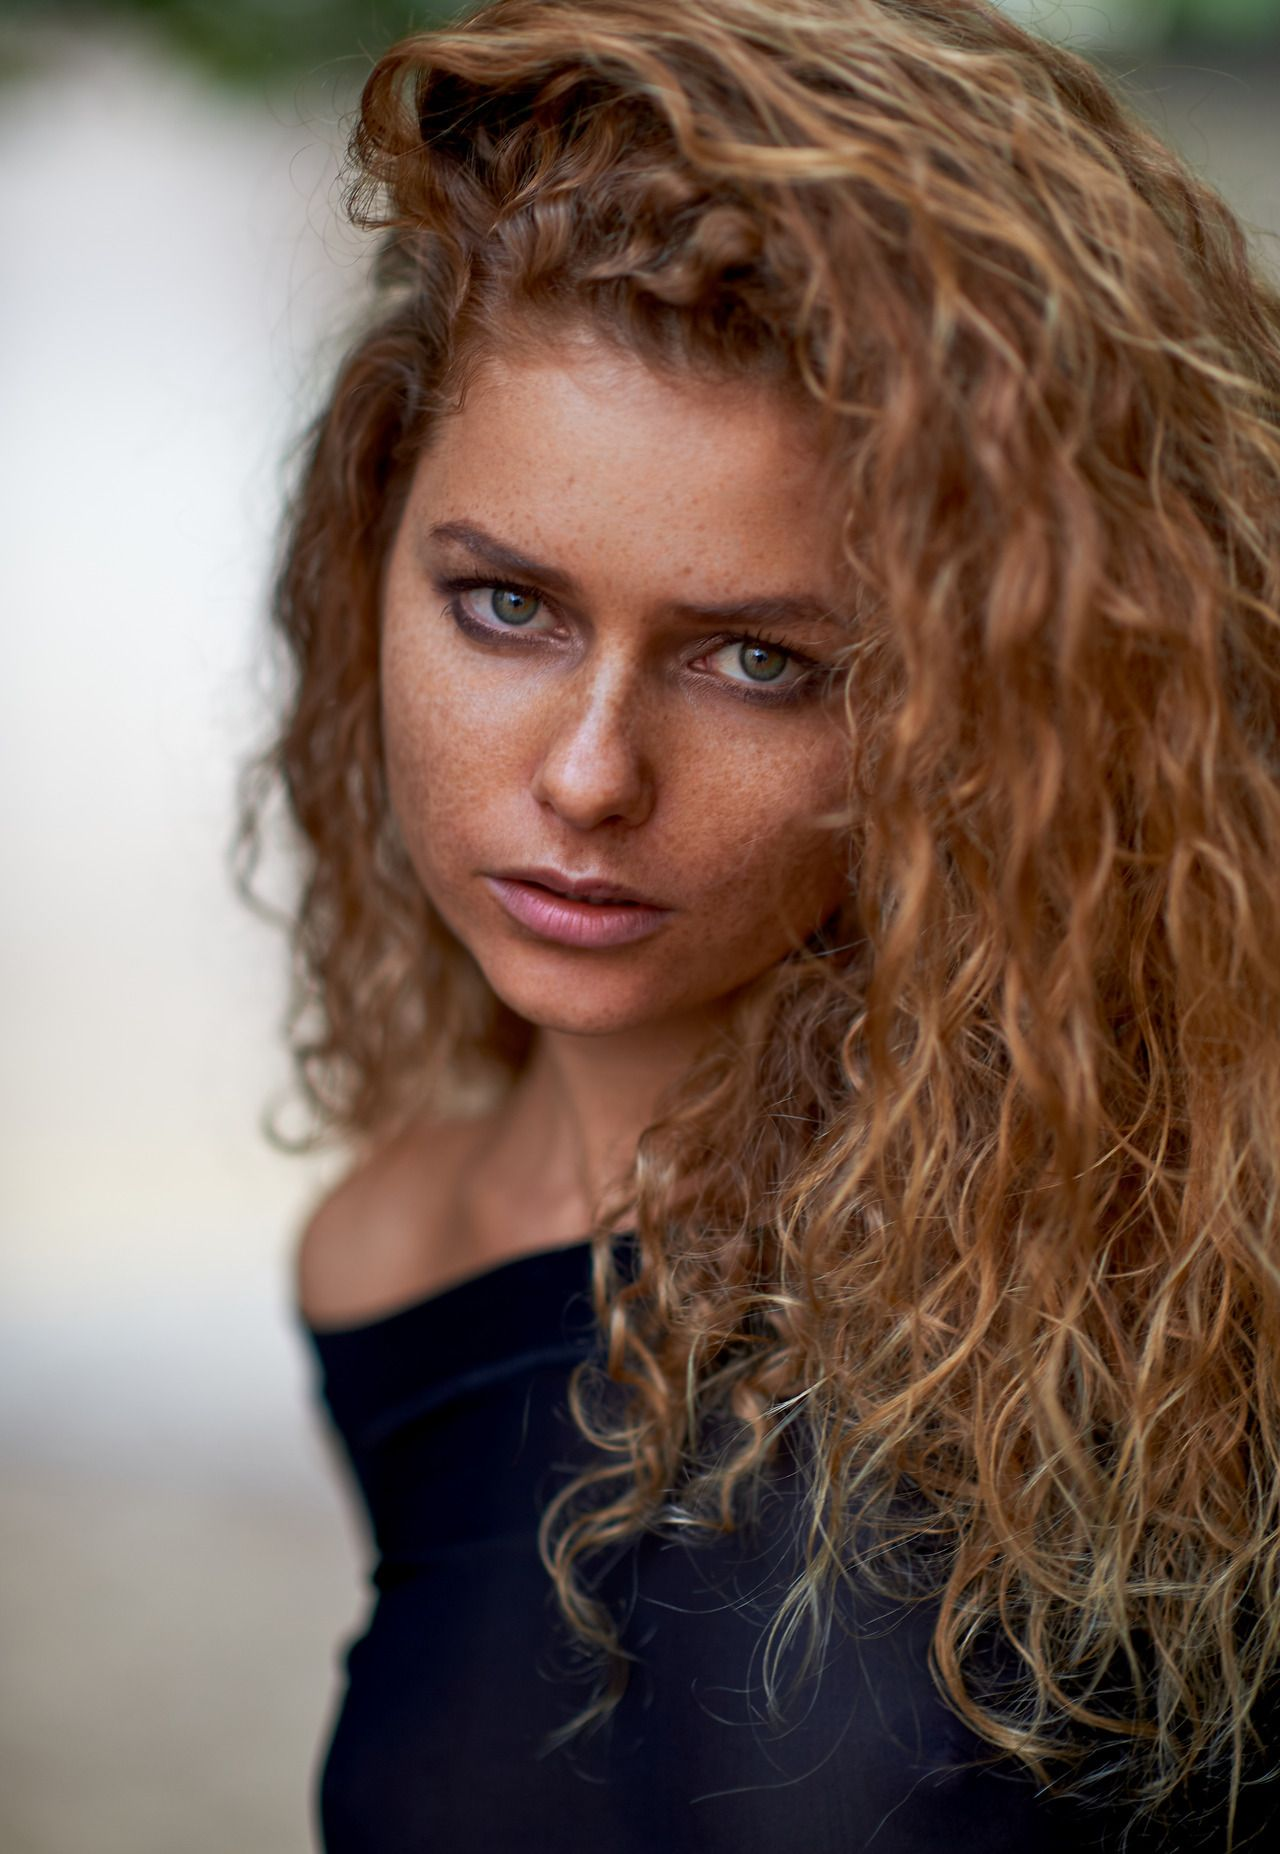 Yulia Yaroshenko.   Arte del retrato, Retratos, Pelirrojas